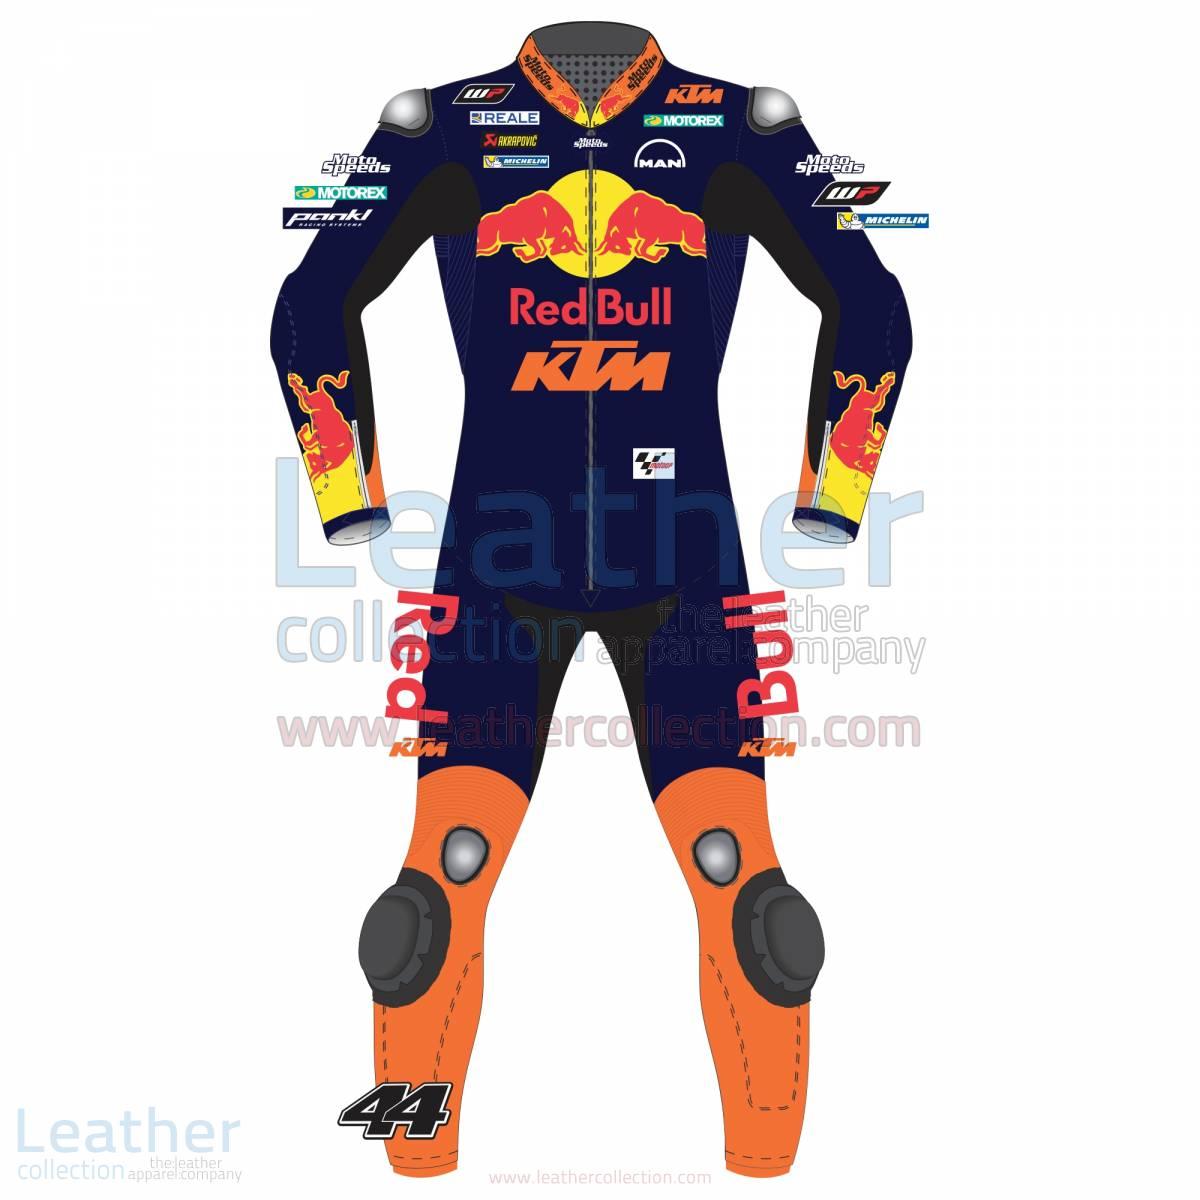 Red Bull suit